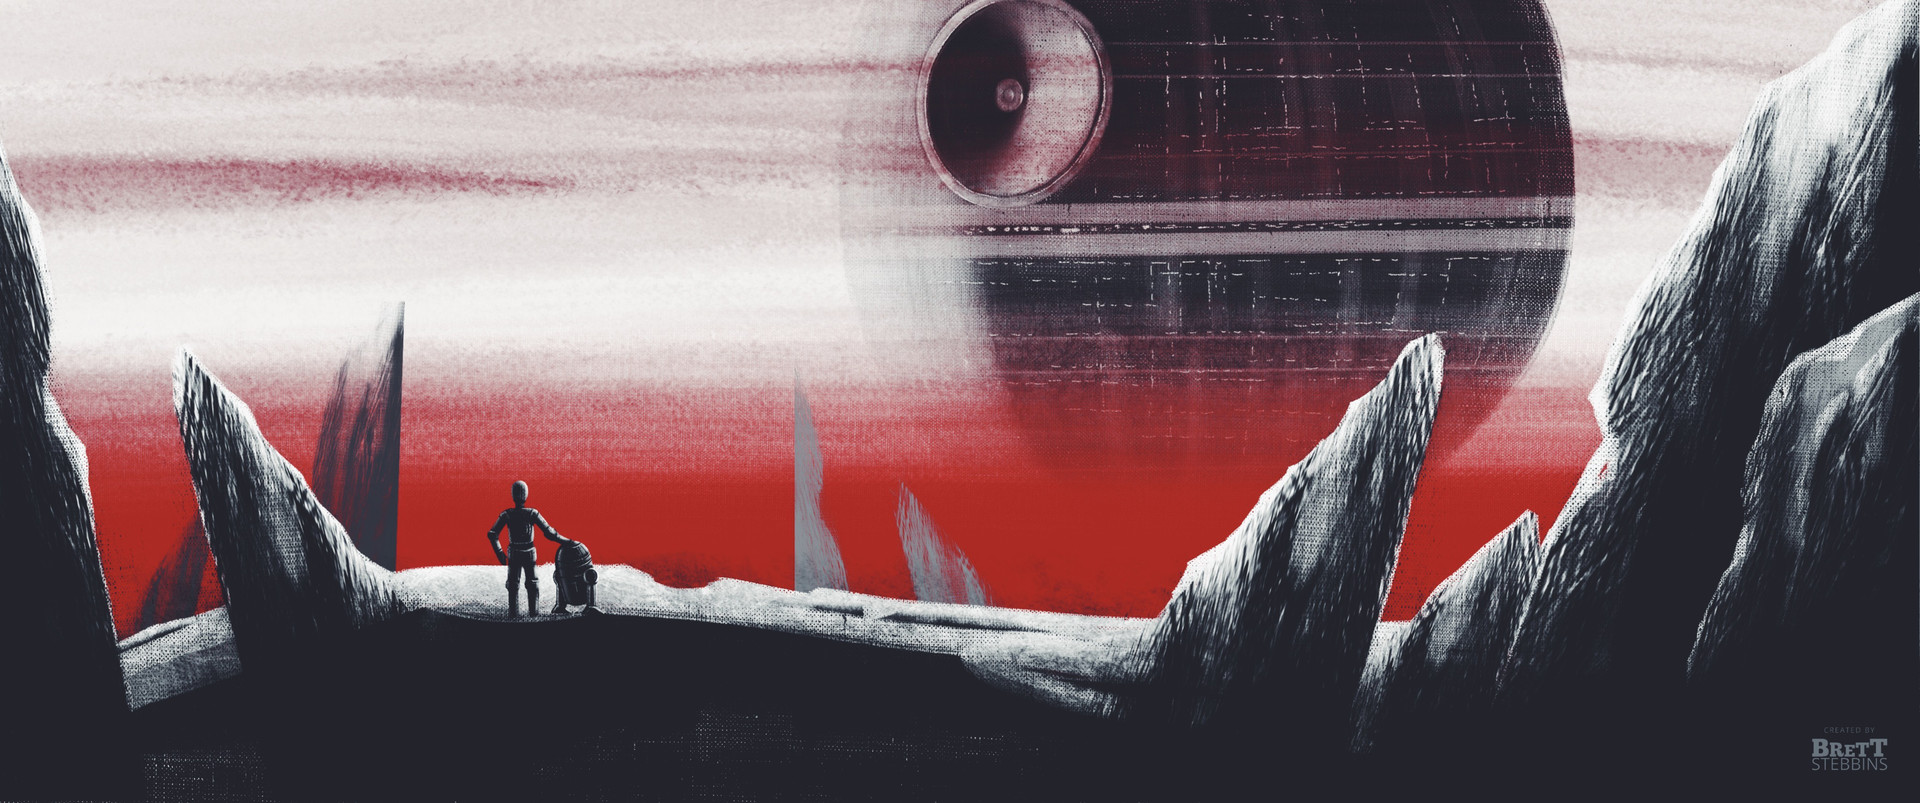 Brett stebbins death star rising red 03 2048px